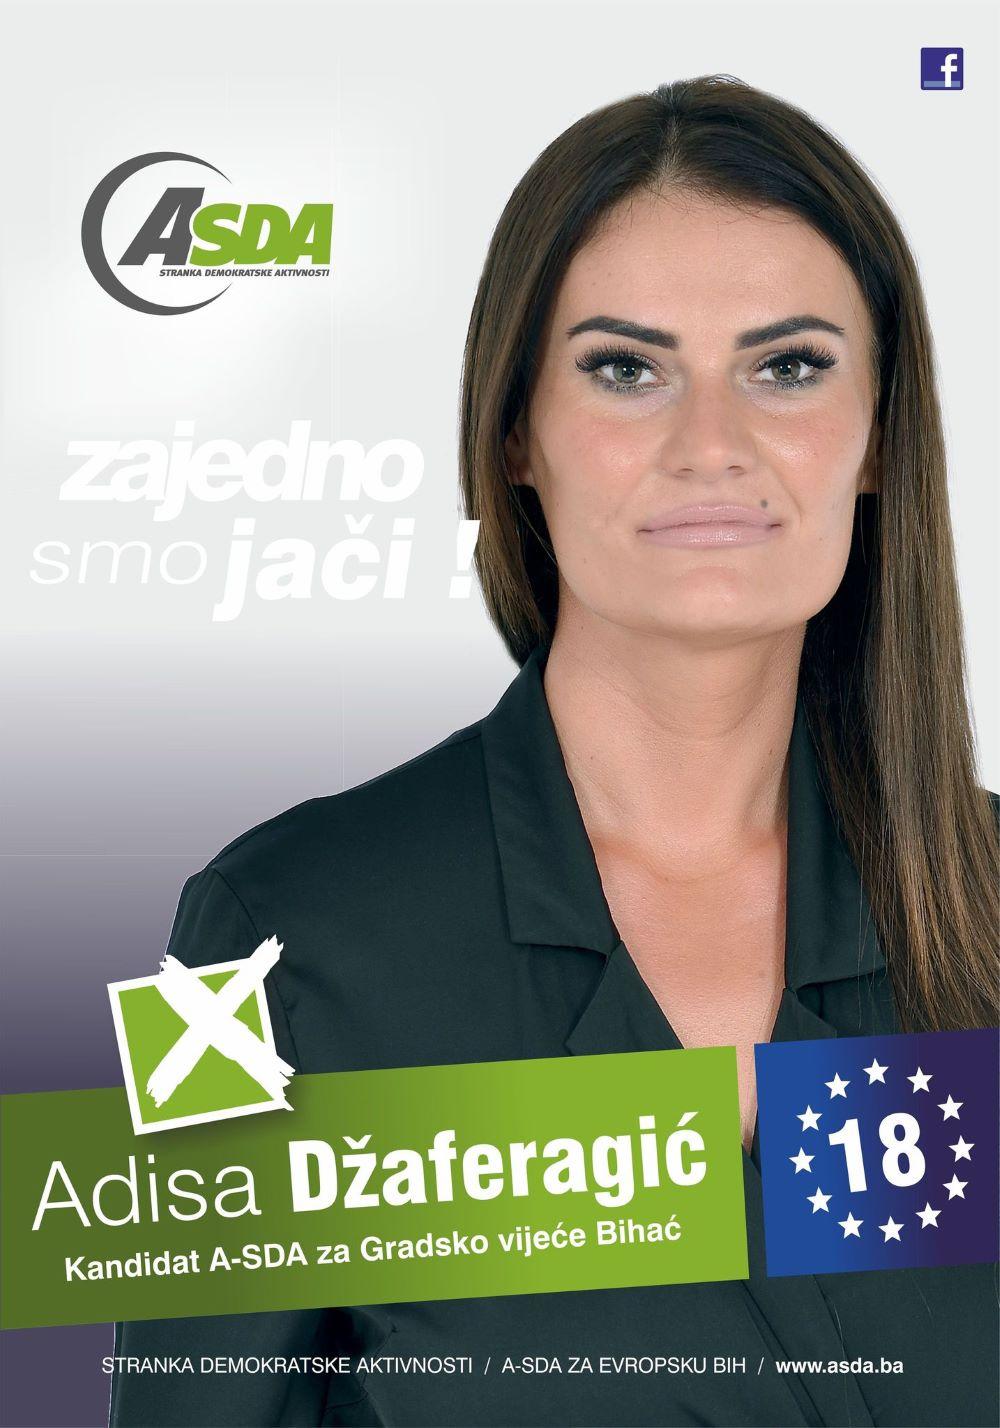 Adisa Džaferagić